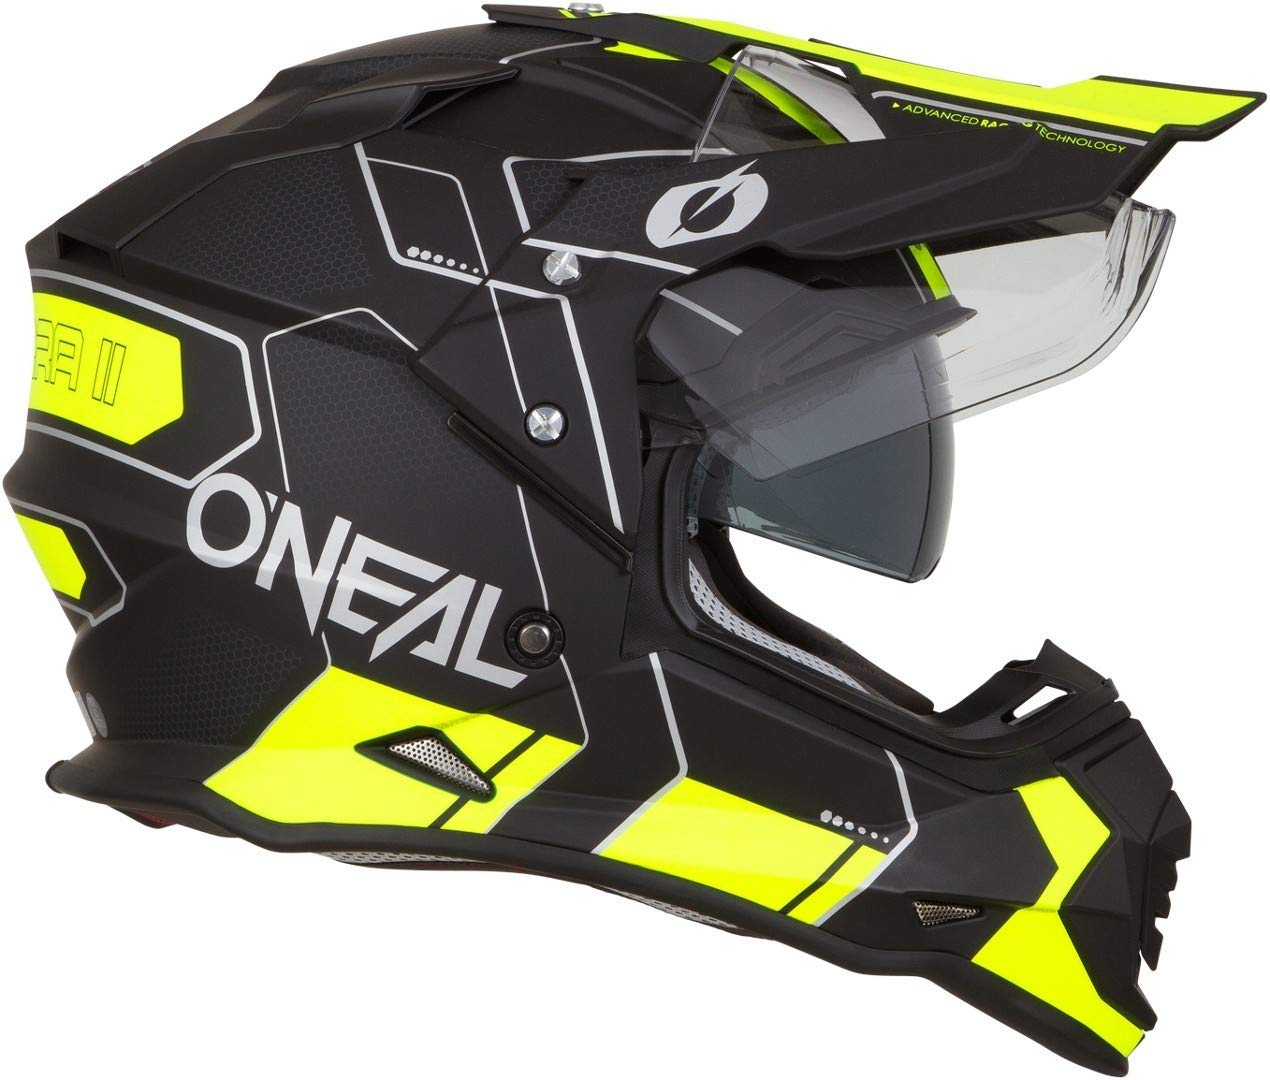 Farbe Schwarz Neon Gelb 0817 ONeal Sierra II Comb Motocross Motorrad Helm MX Enduro Trail Quad Cross Offroad Gel/ände Gr/ö/ße S